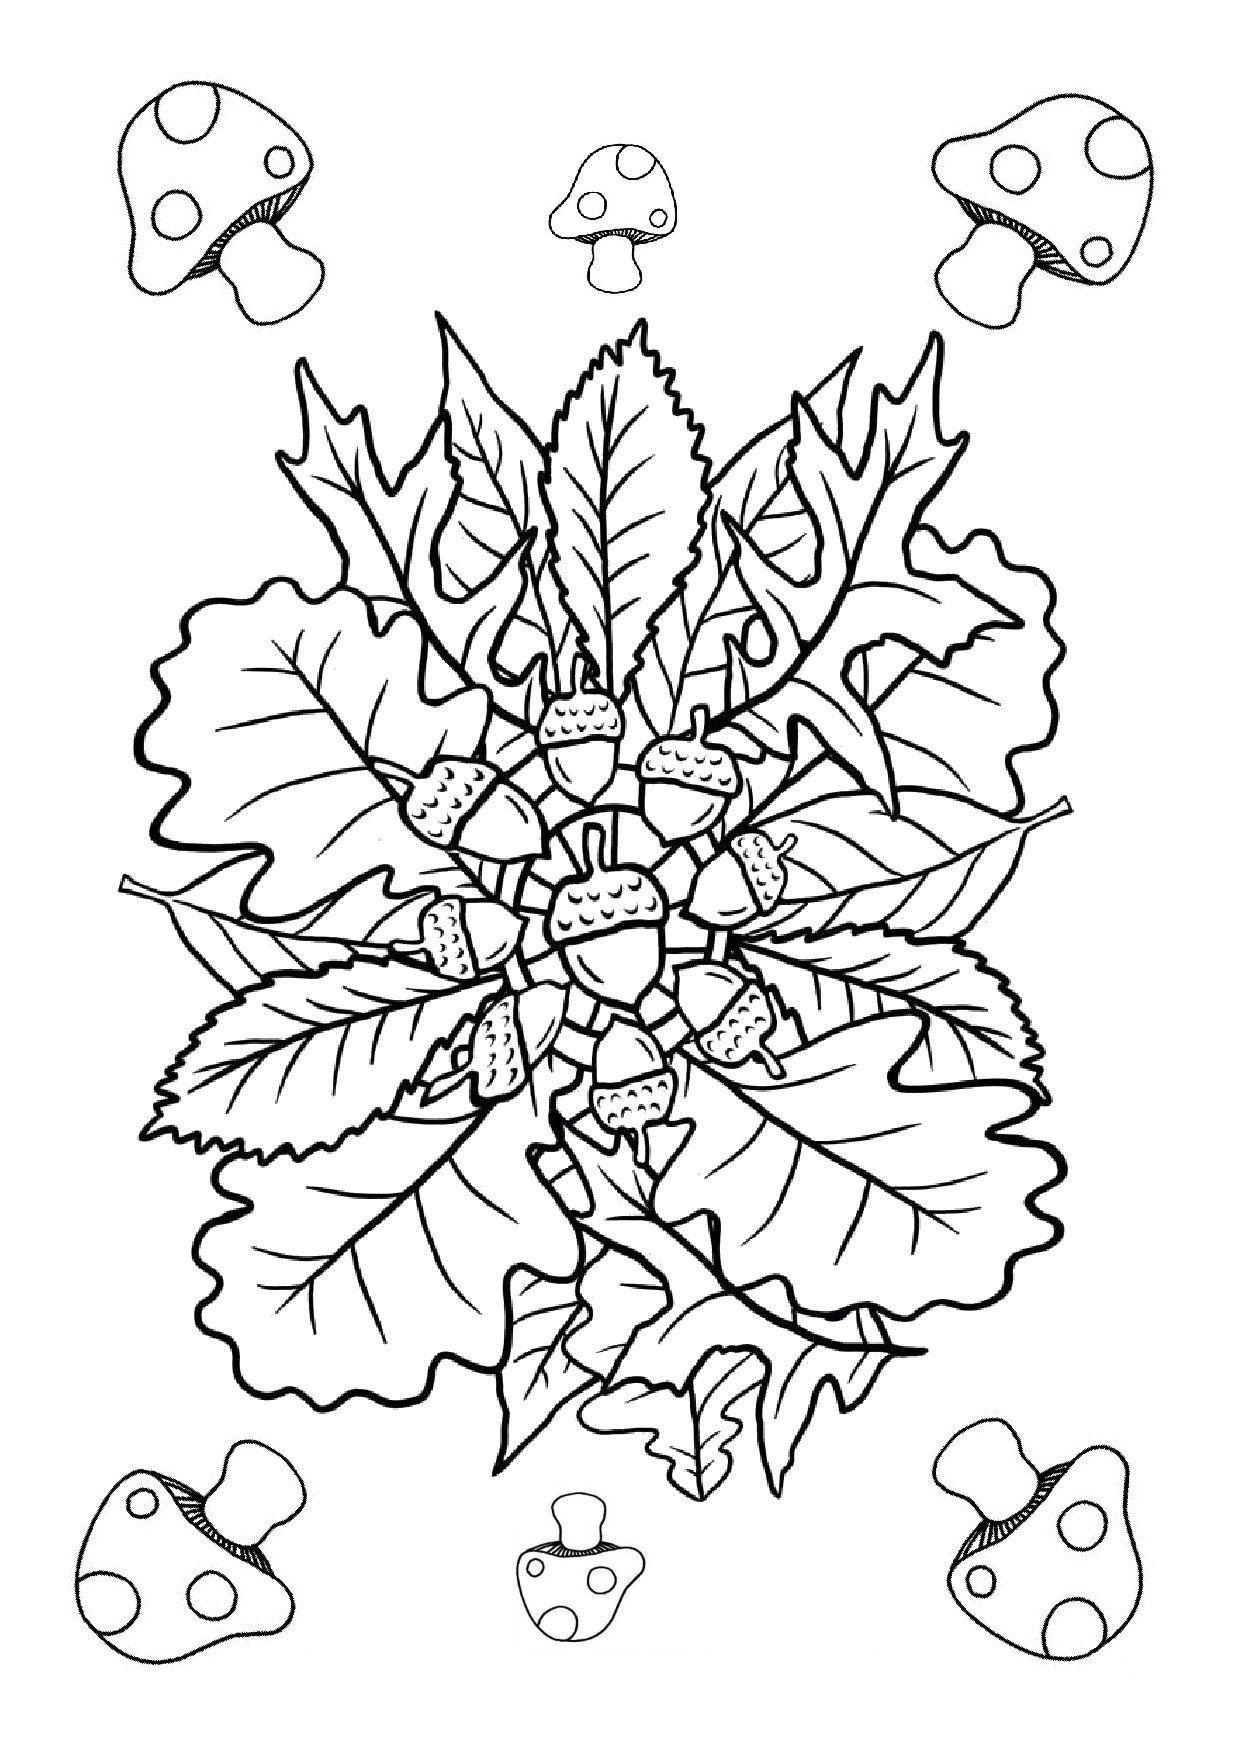 Herfstbladeren... | Mandala | Pinterest | Mandala, Embroidery and Crafts